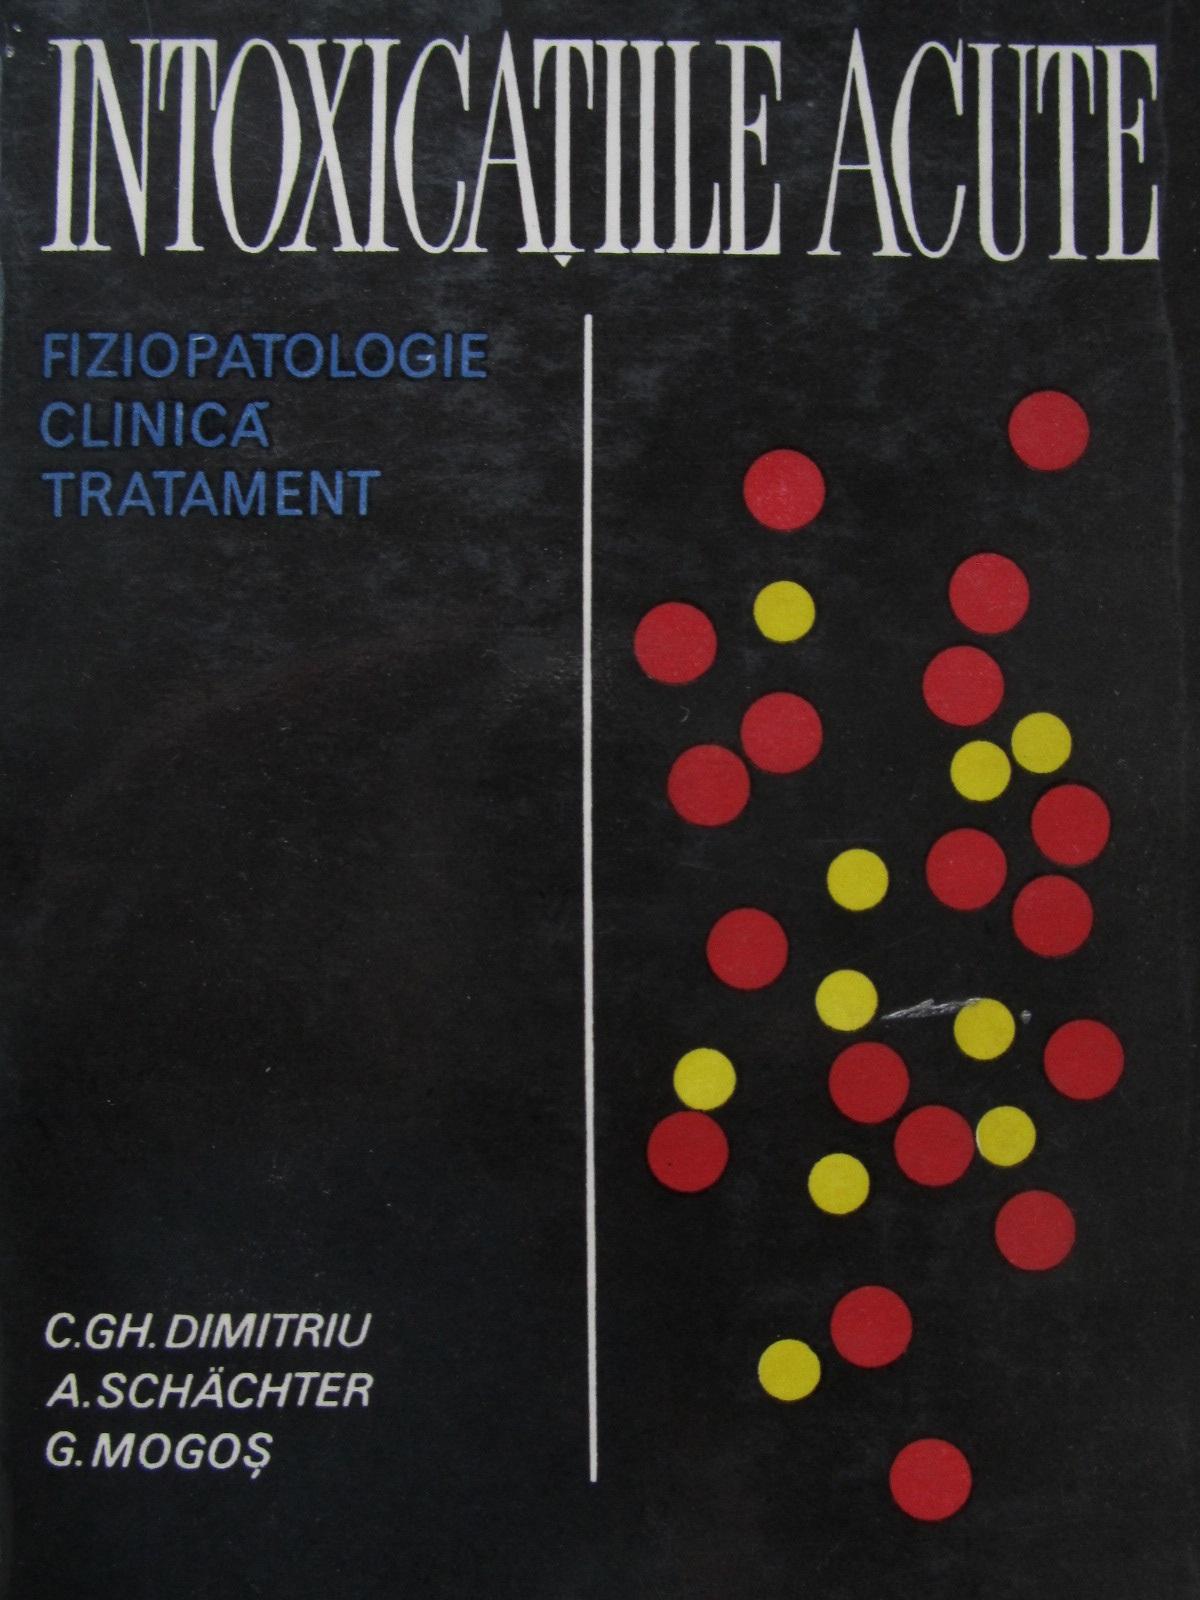 Intoxicatiile acute - fiziopatologie clinica tratament - C. Gh. Dimitriu , A. Schachter , ... | Detalii carte